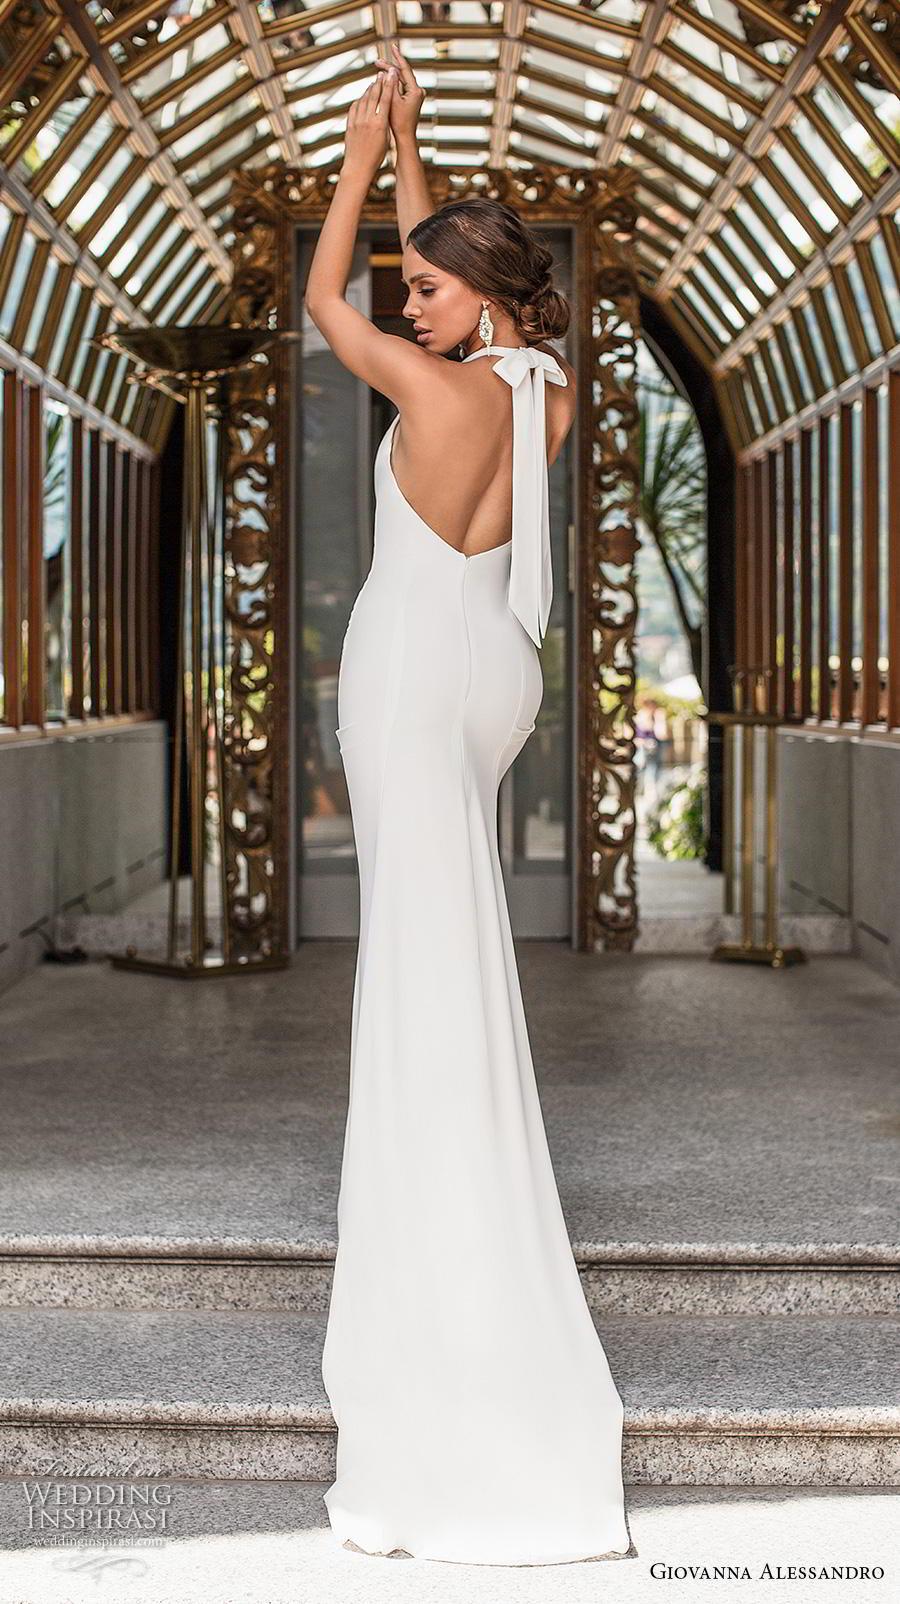 giovanna alessandro 2019 bridal sleeveless halter neck simple minimalist elegant sheath wedding dress backless chapel train (6) bv